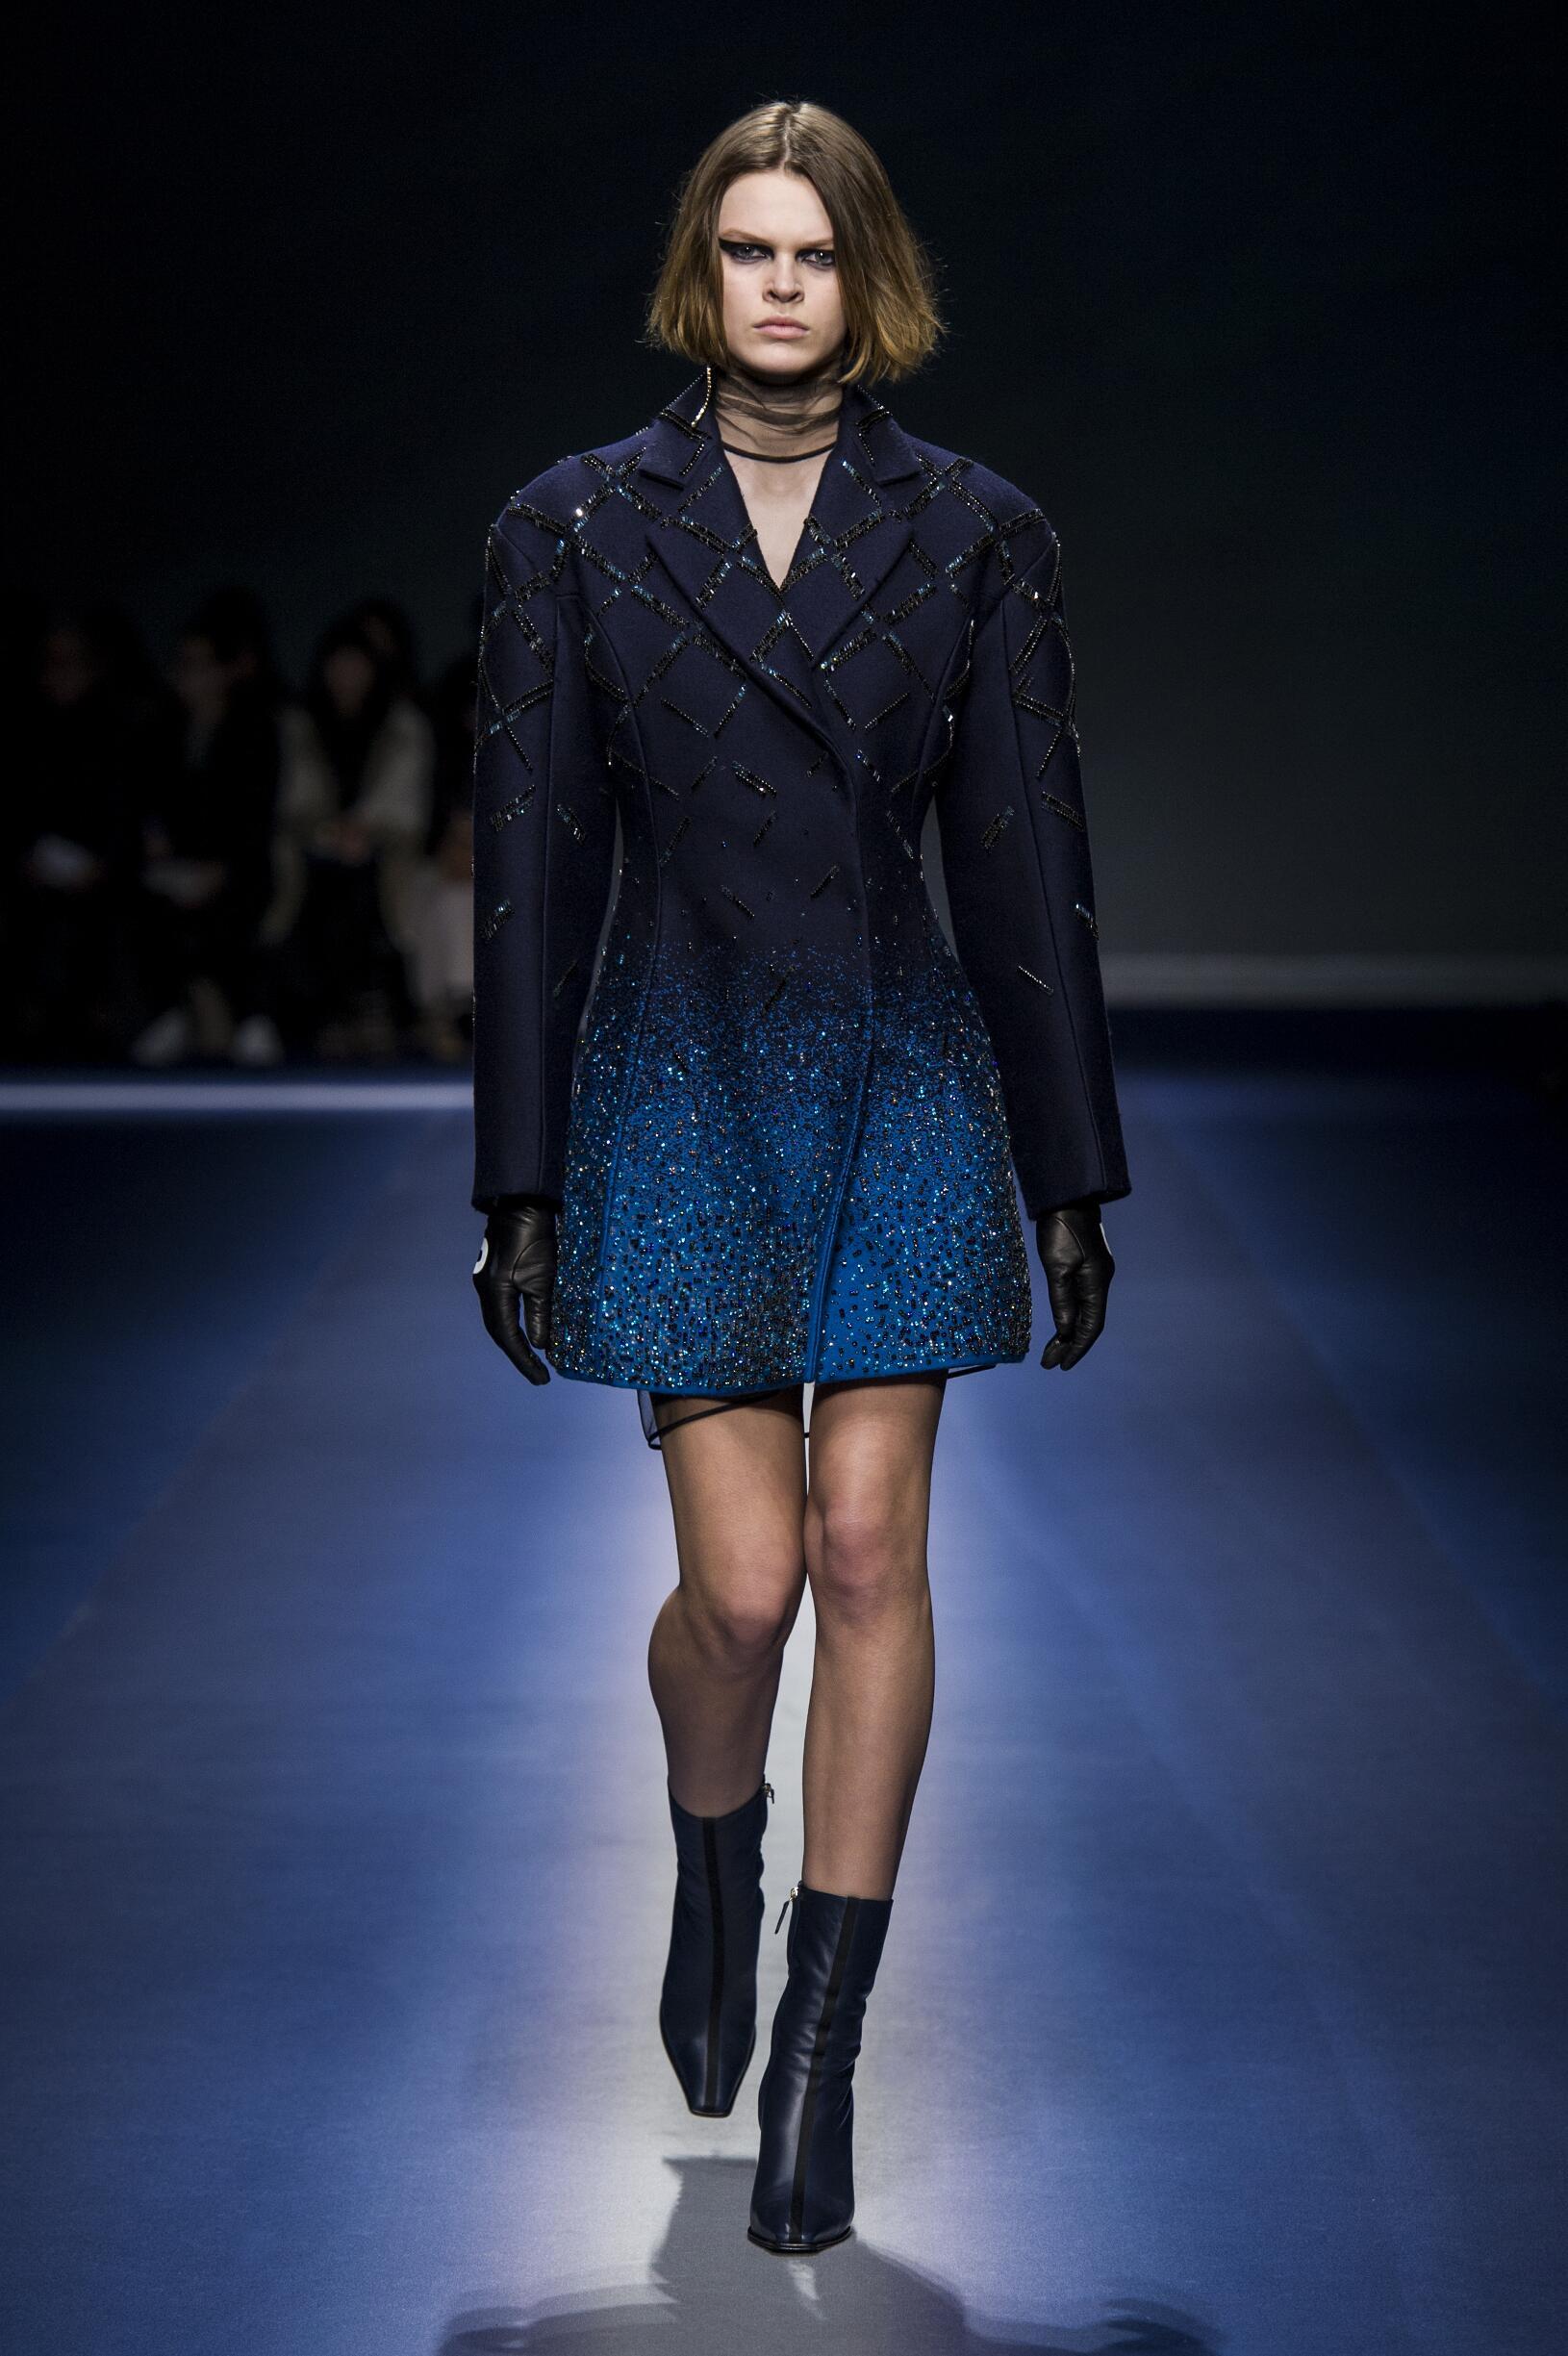 2017-18 Catwalk Versace Woman Fashion Show Winter